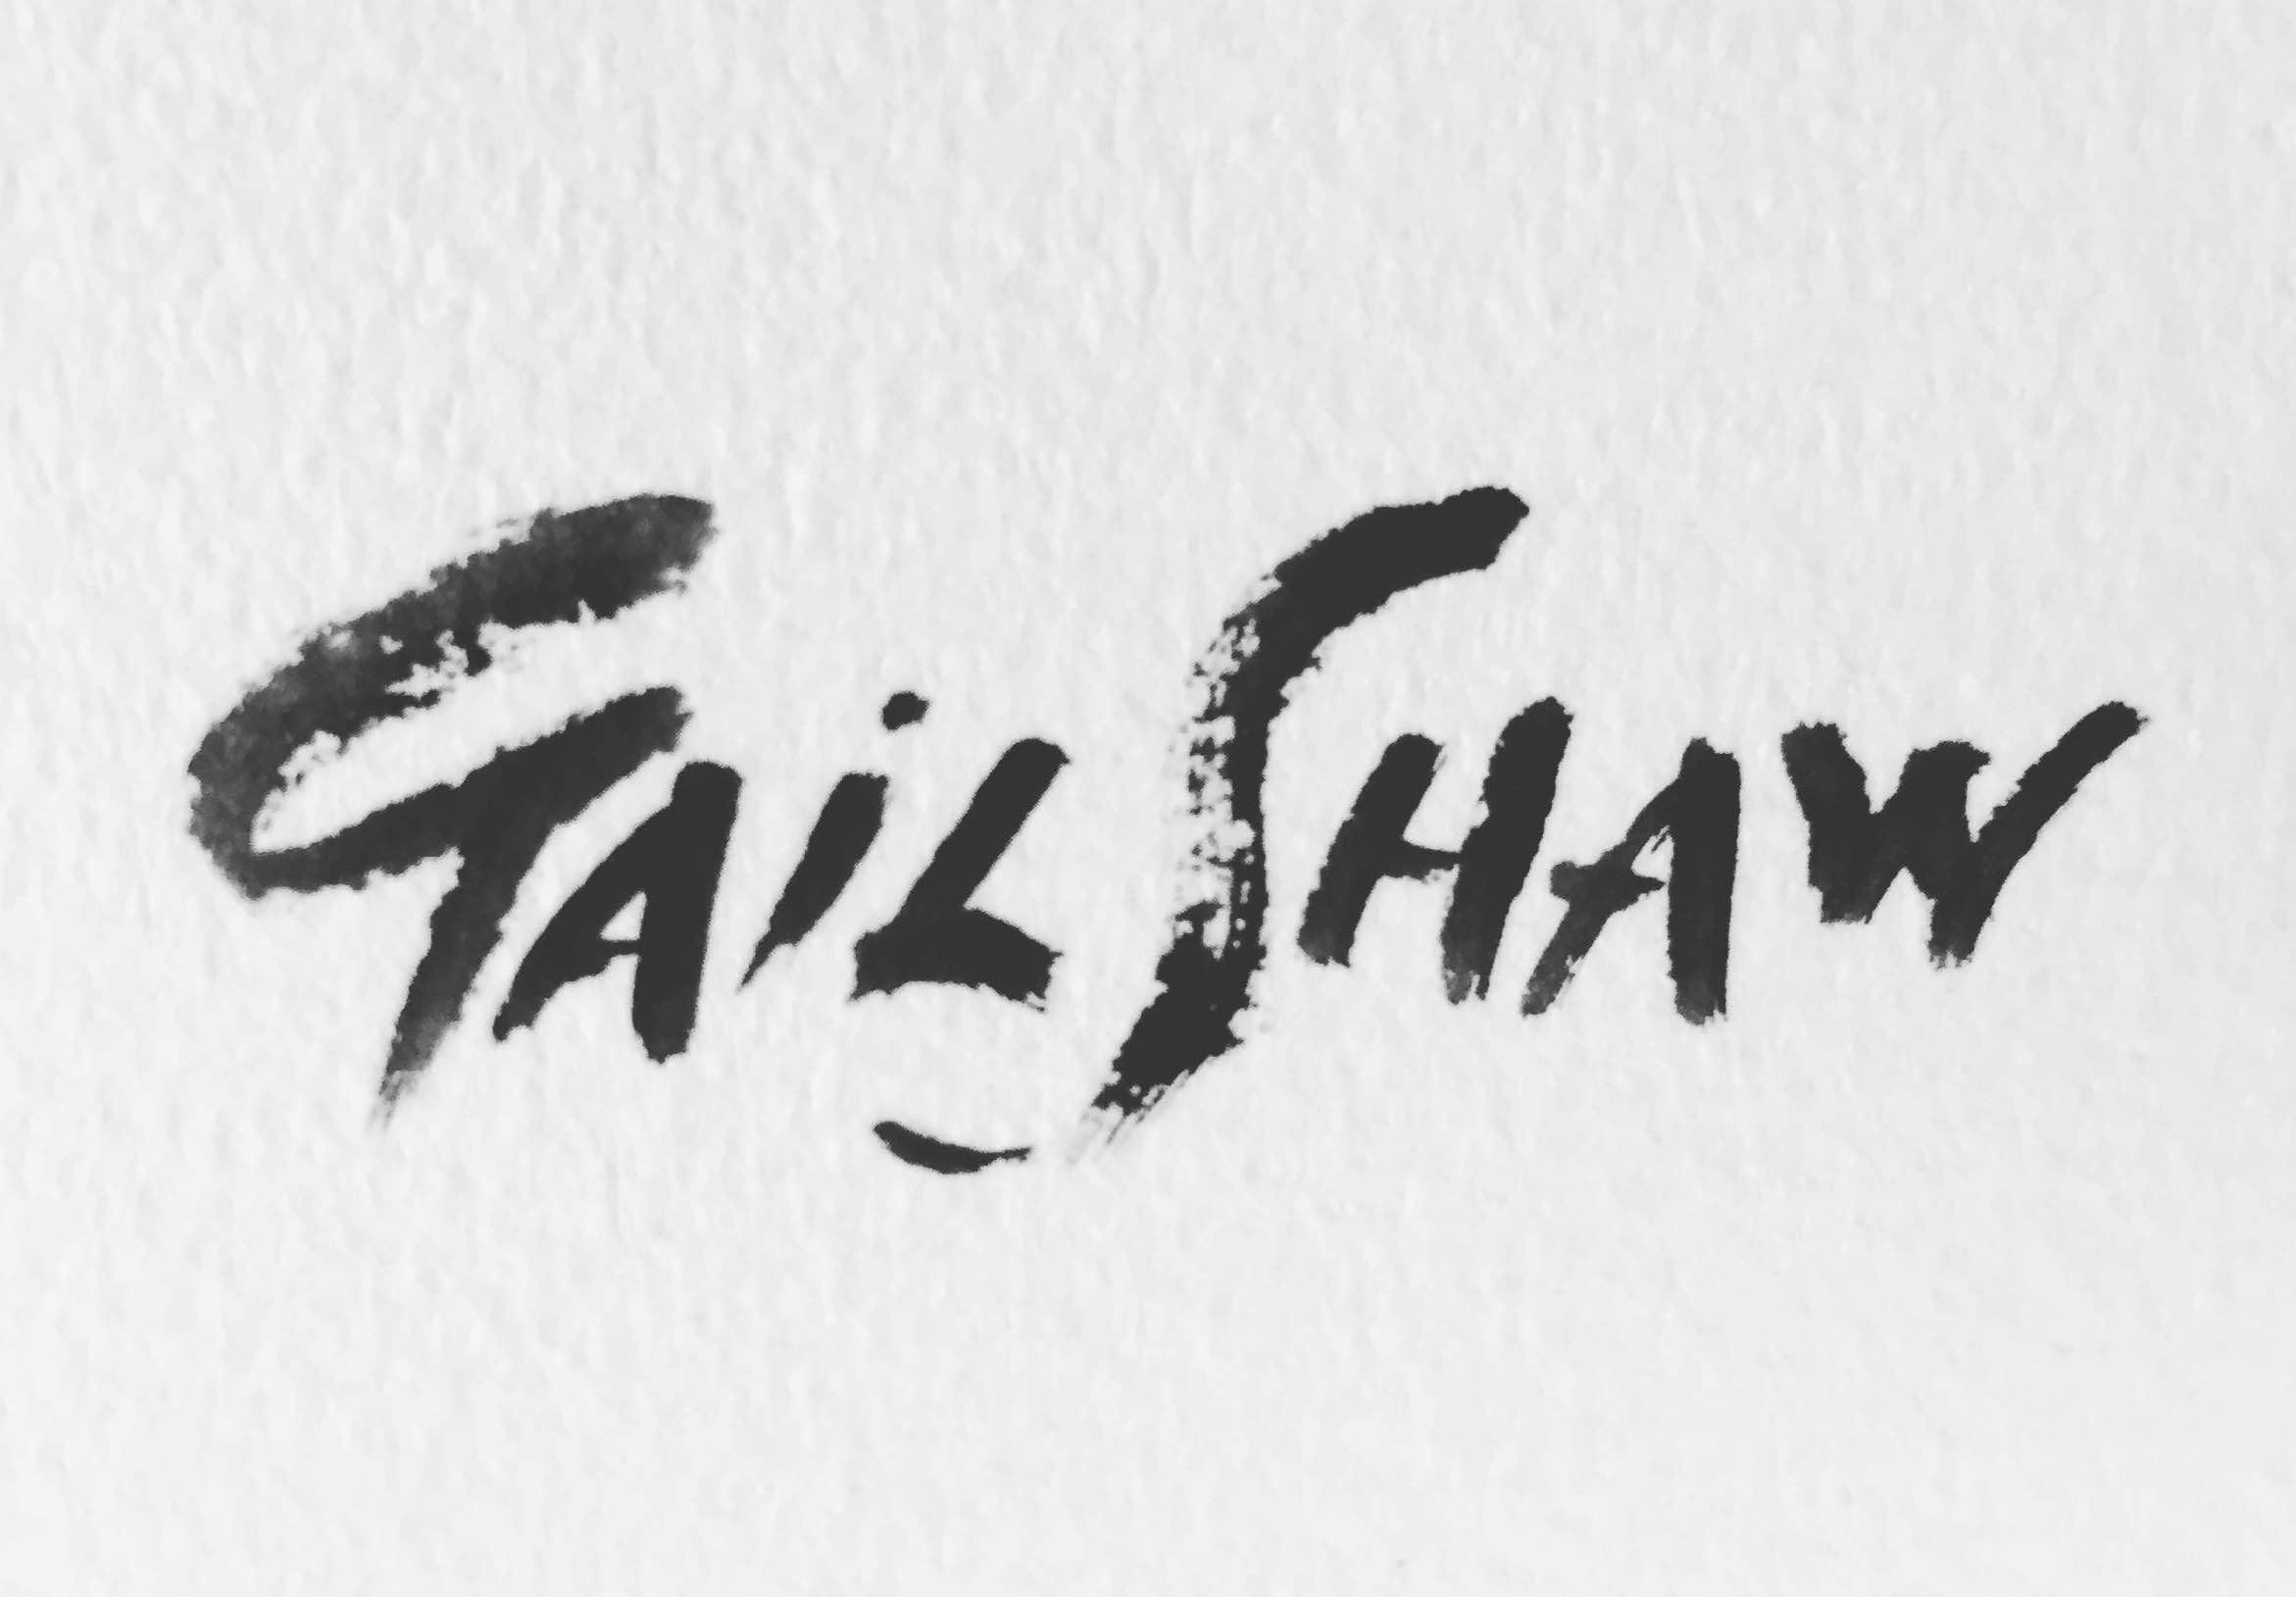 Gail Shaw's Signature